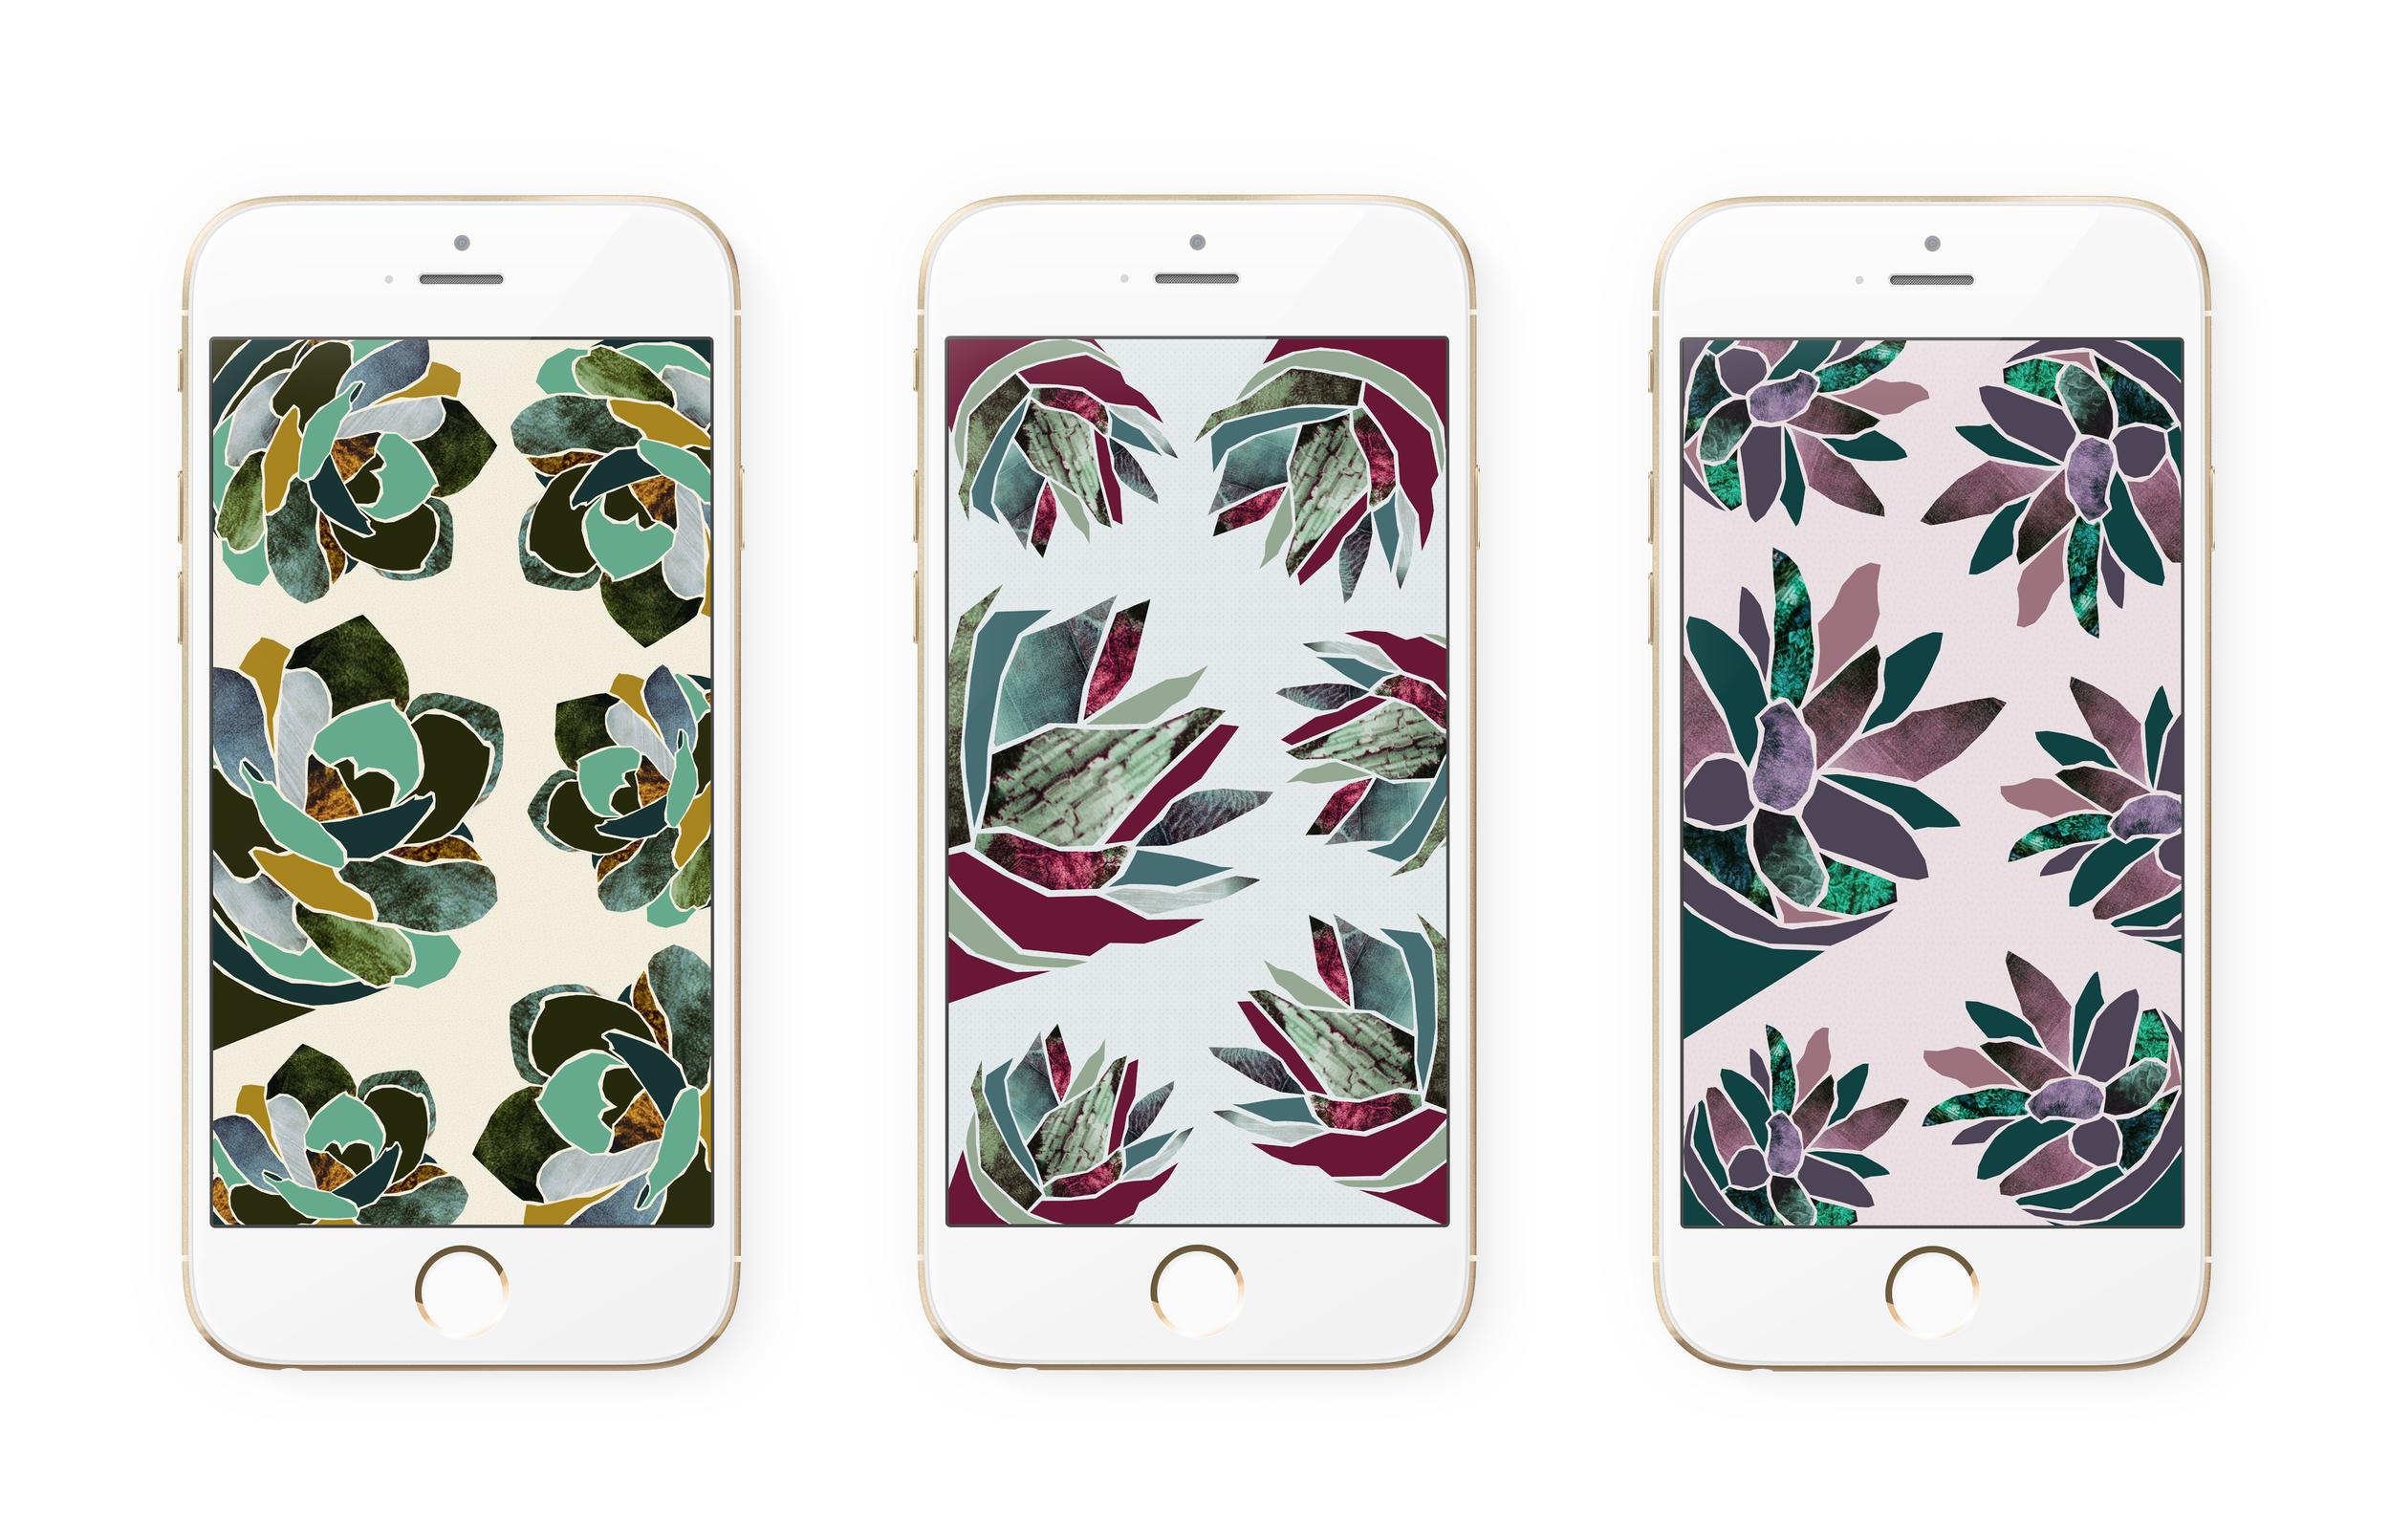 Succulent iPhone wallpaper | Freckle & Fair